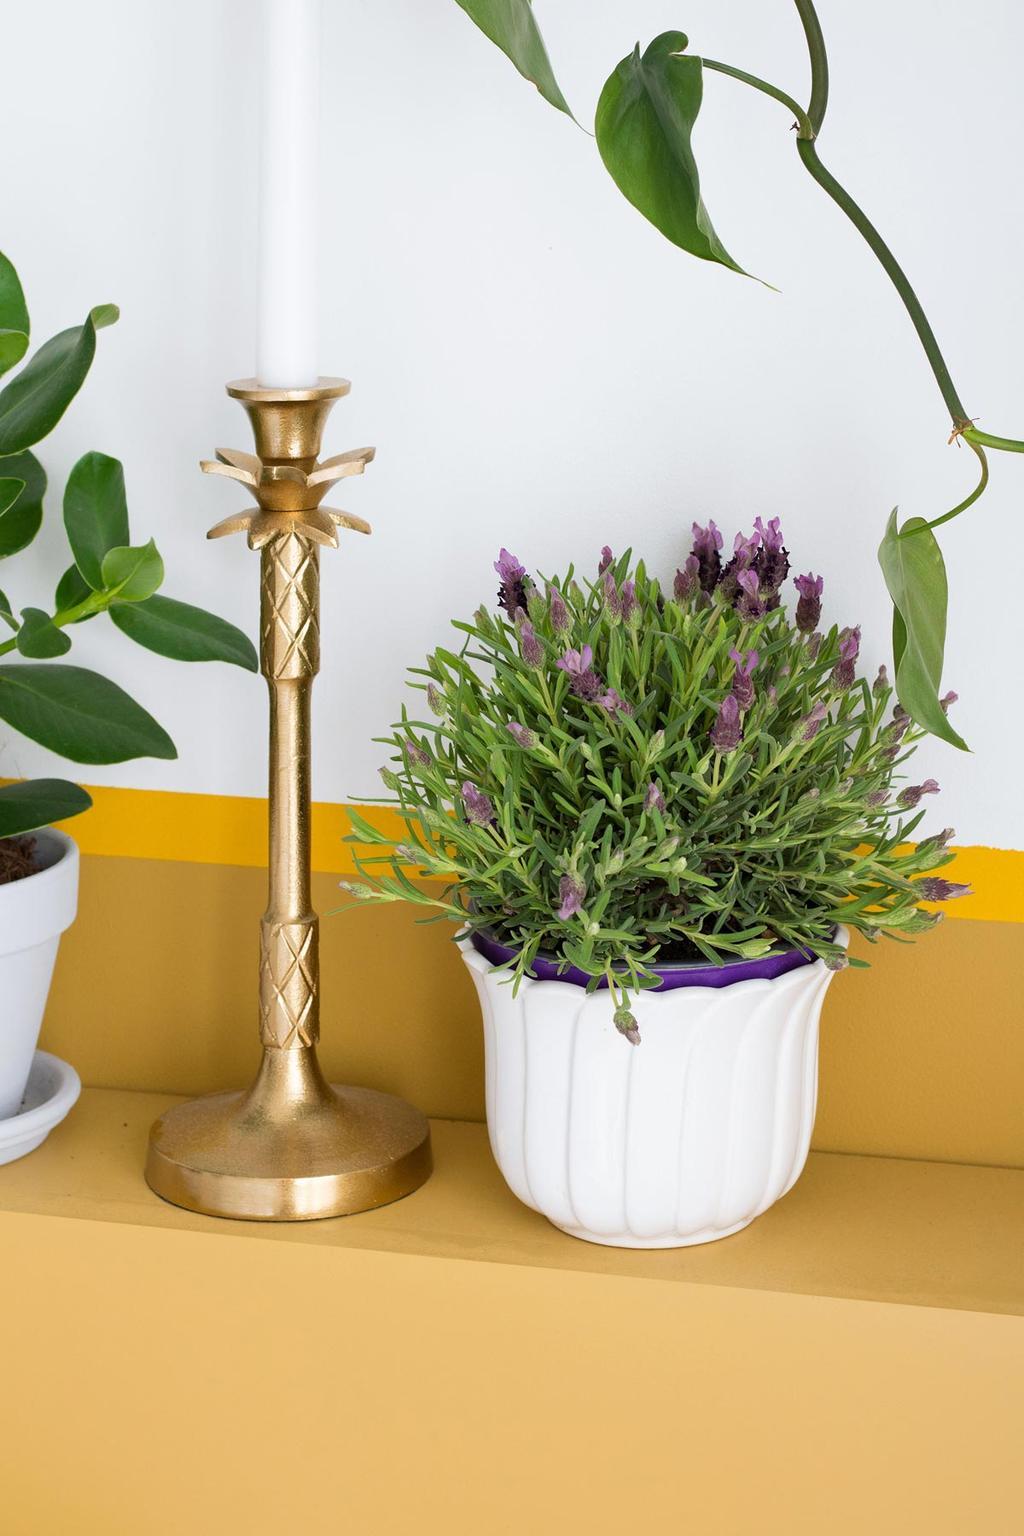 Gele lambrisering met lavendel en planten in de slaapkamer